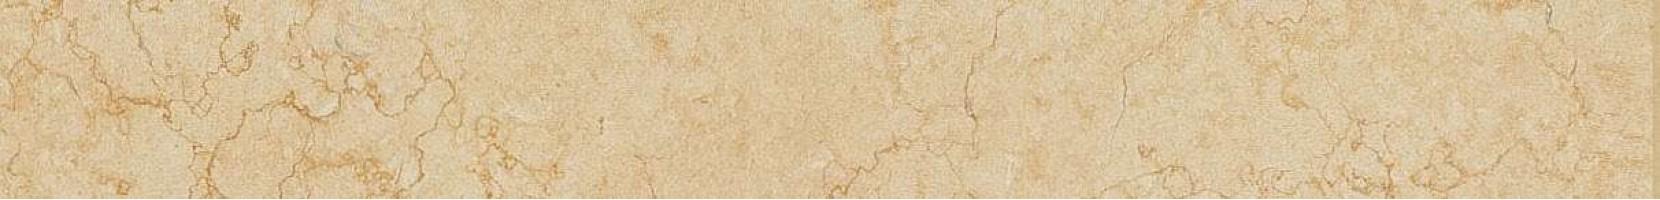 Бордюр Italon Charme Amber Listello Lux 7.2x59 610090001007